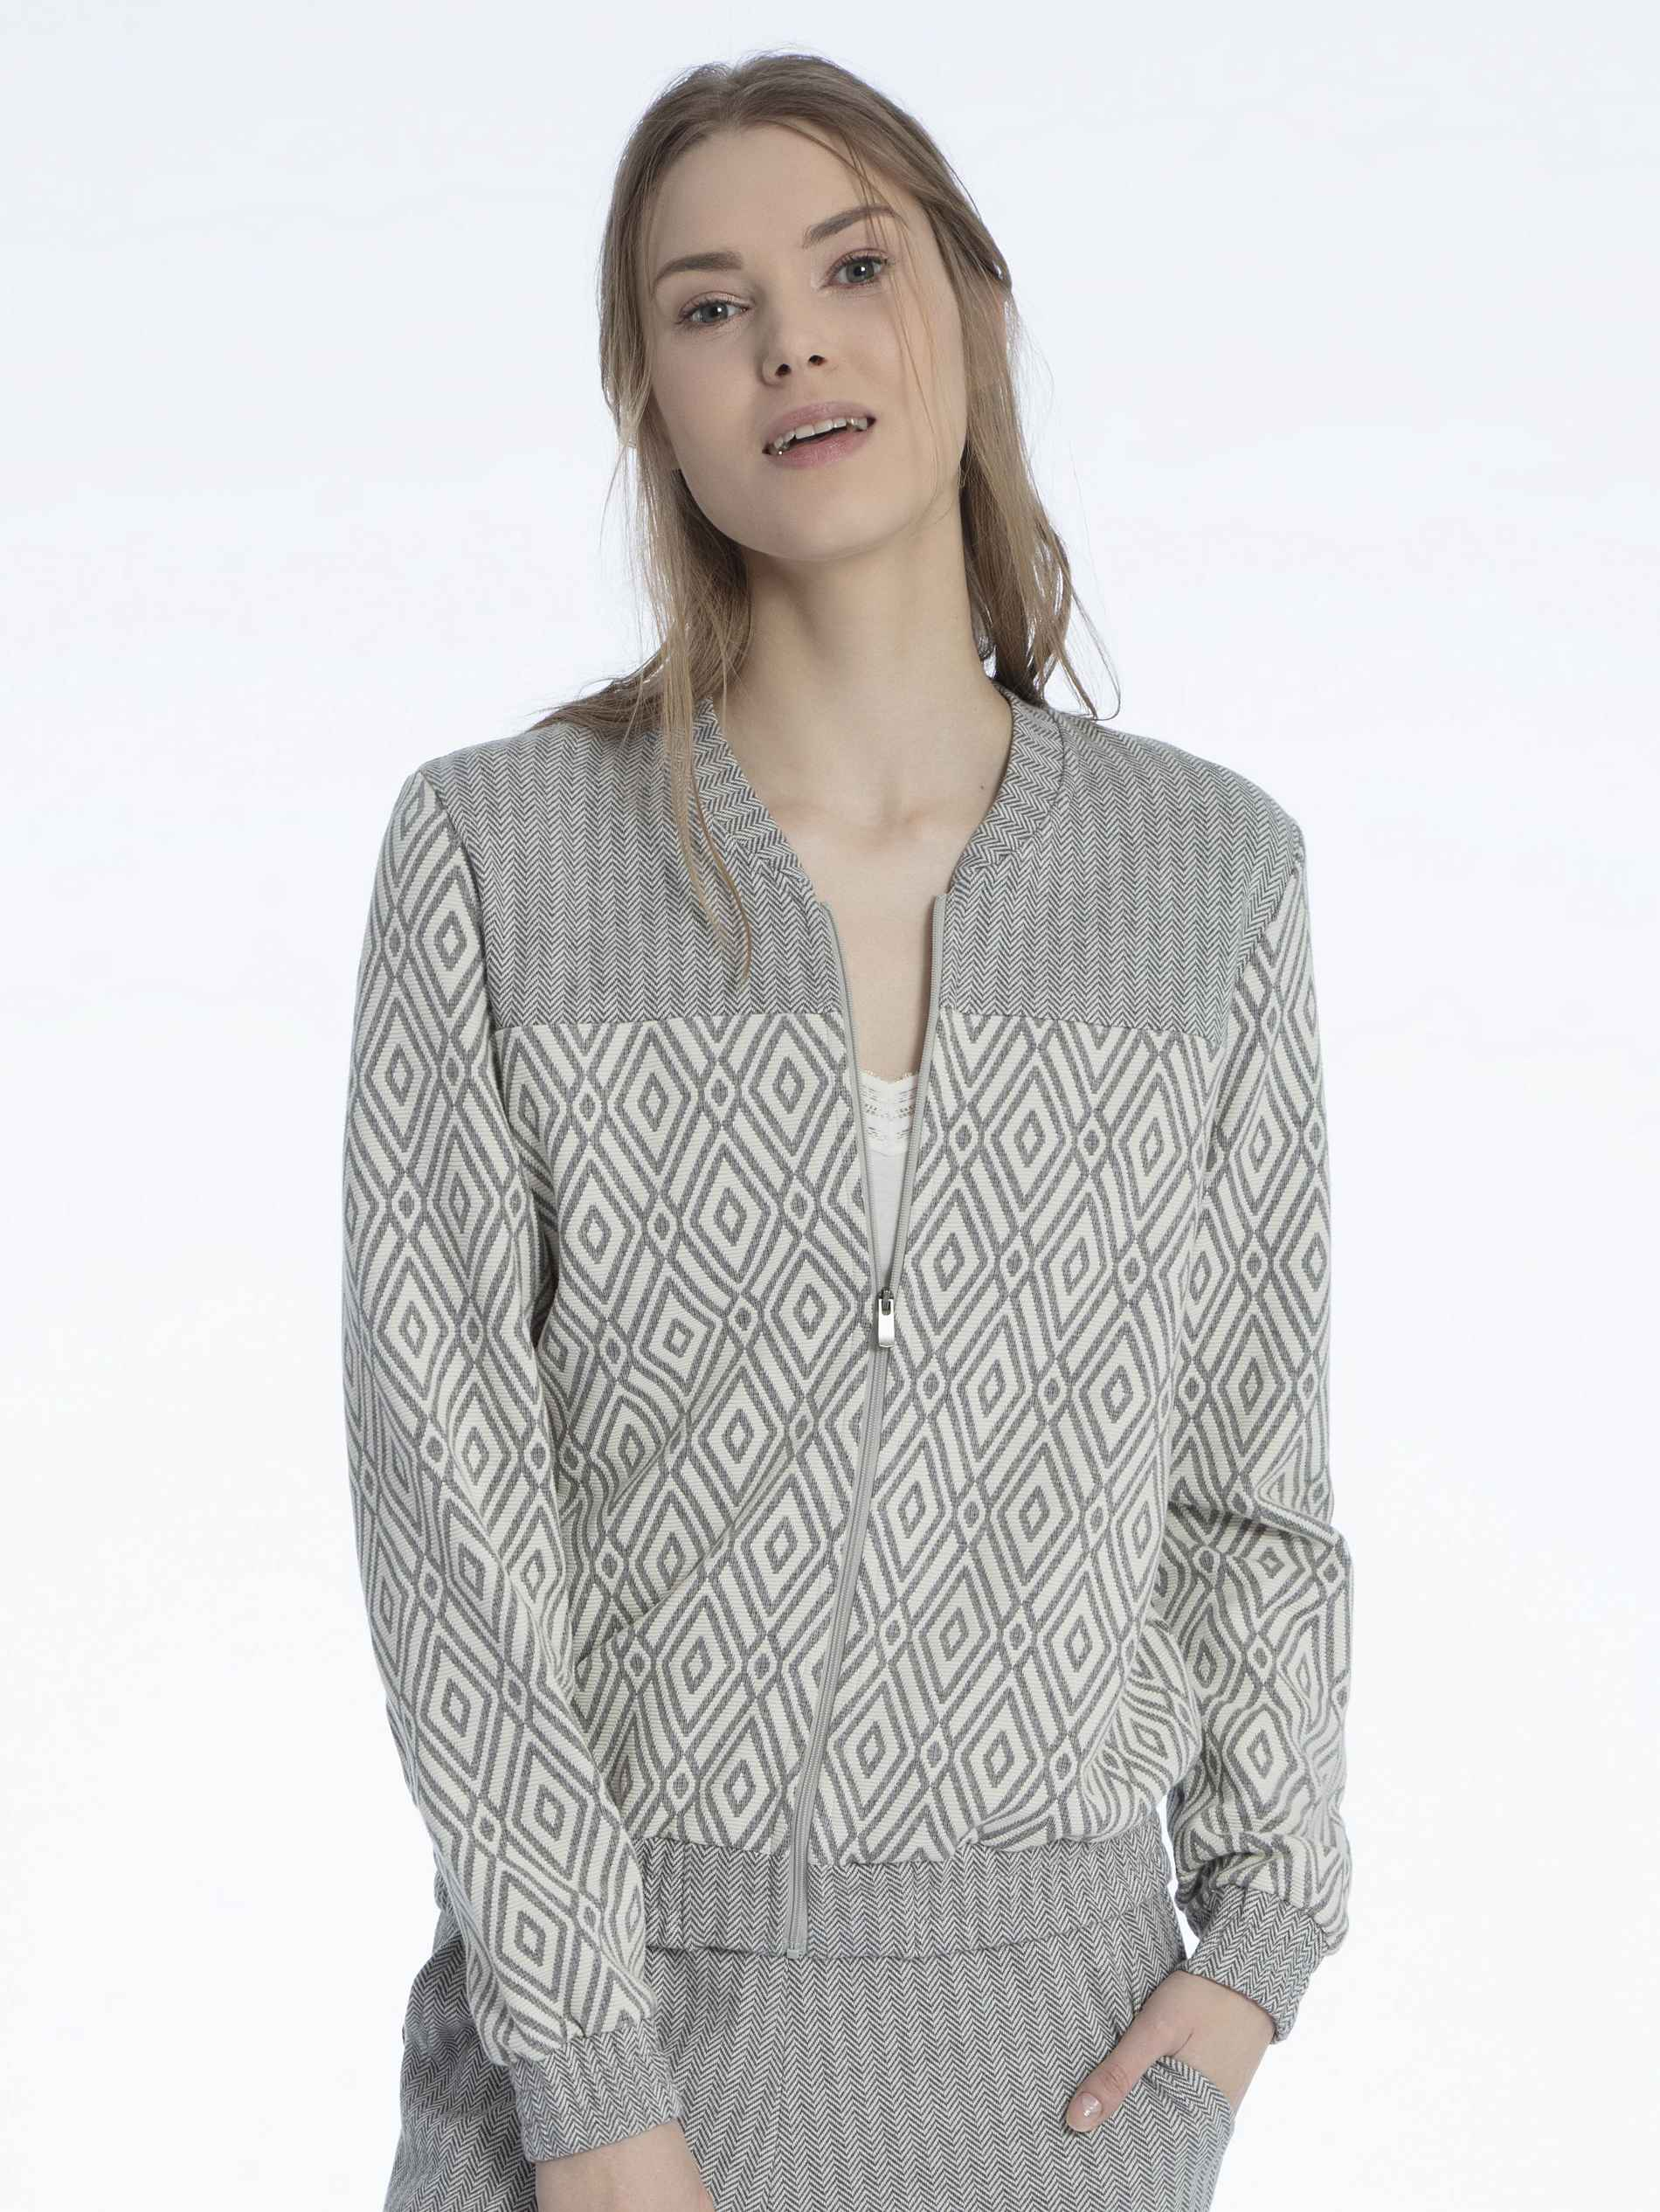 Damen CALIDA Favourites Trend 3 Jacke mit Reißverschluss, Jaquard grau | 07613381036778